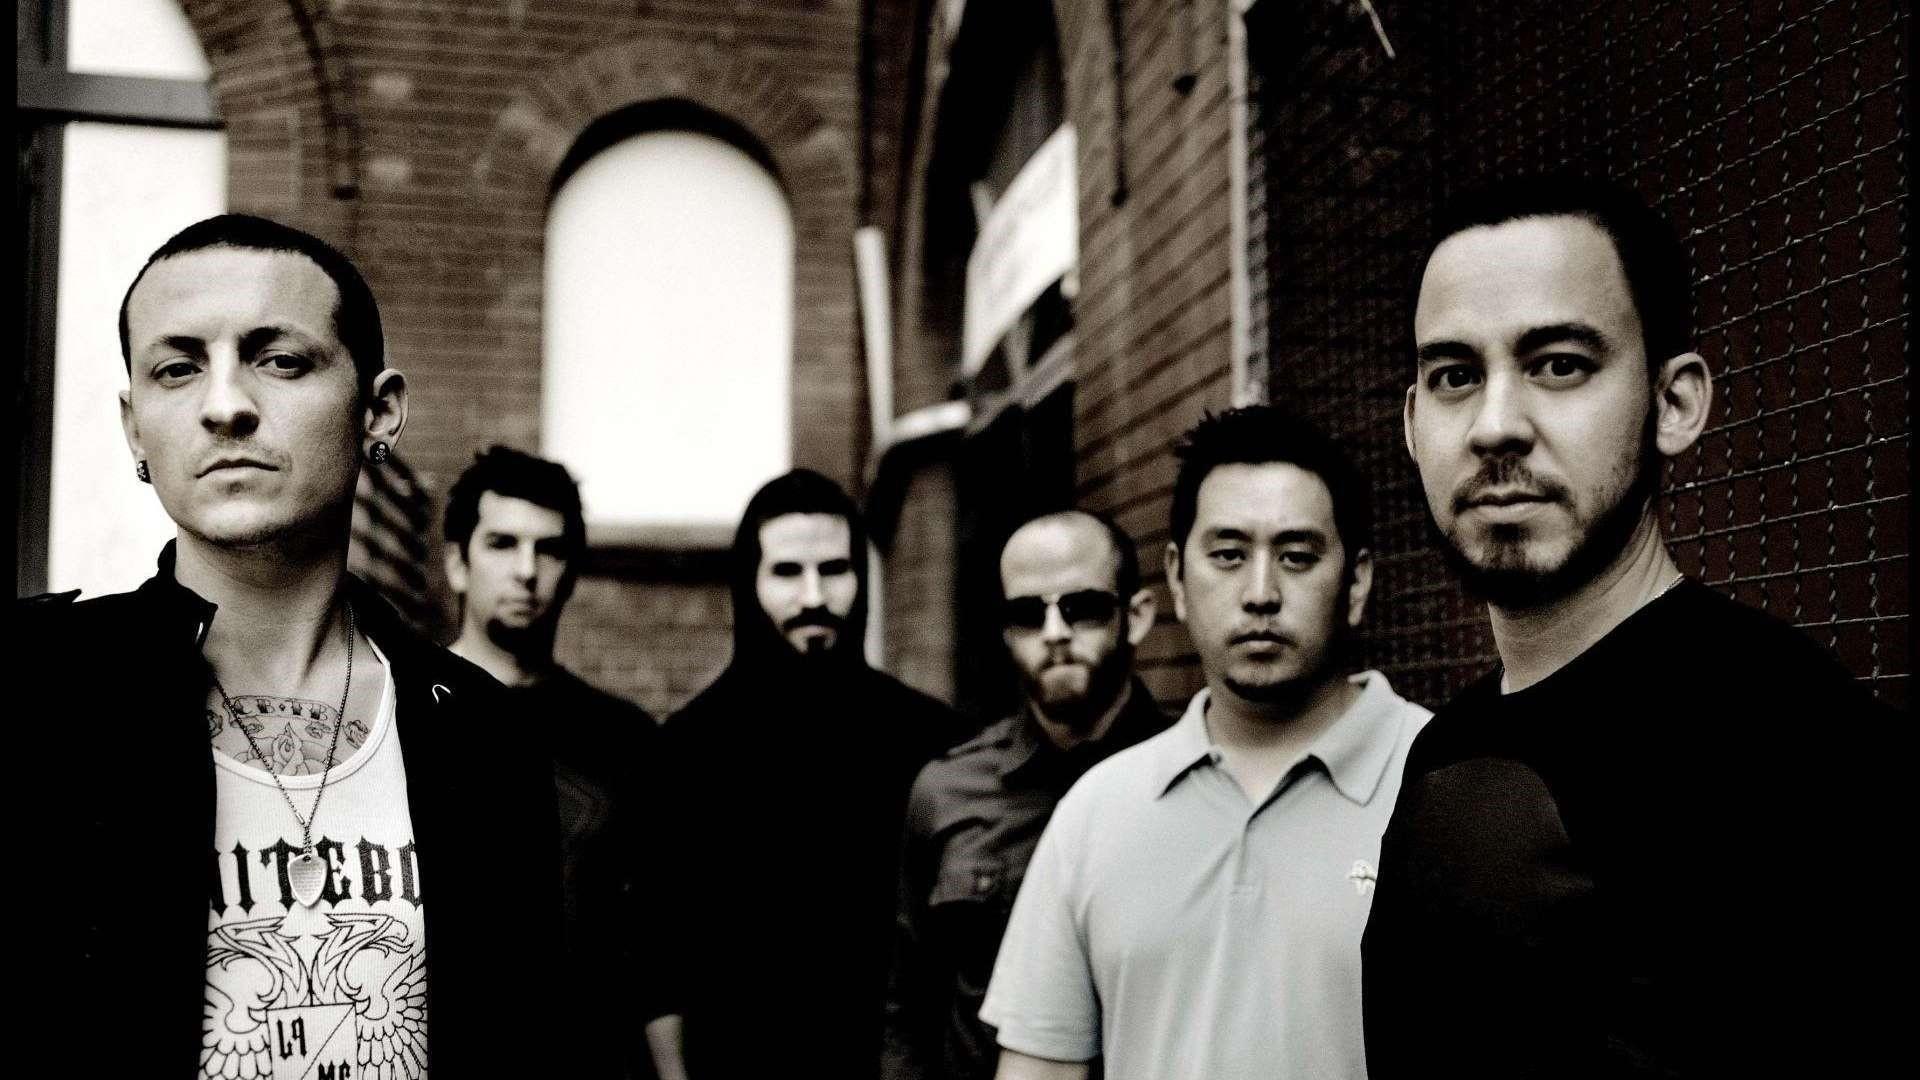 Linkin Park Wallpaper Desktop